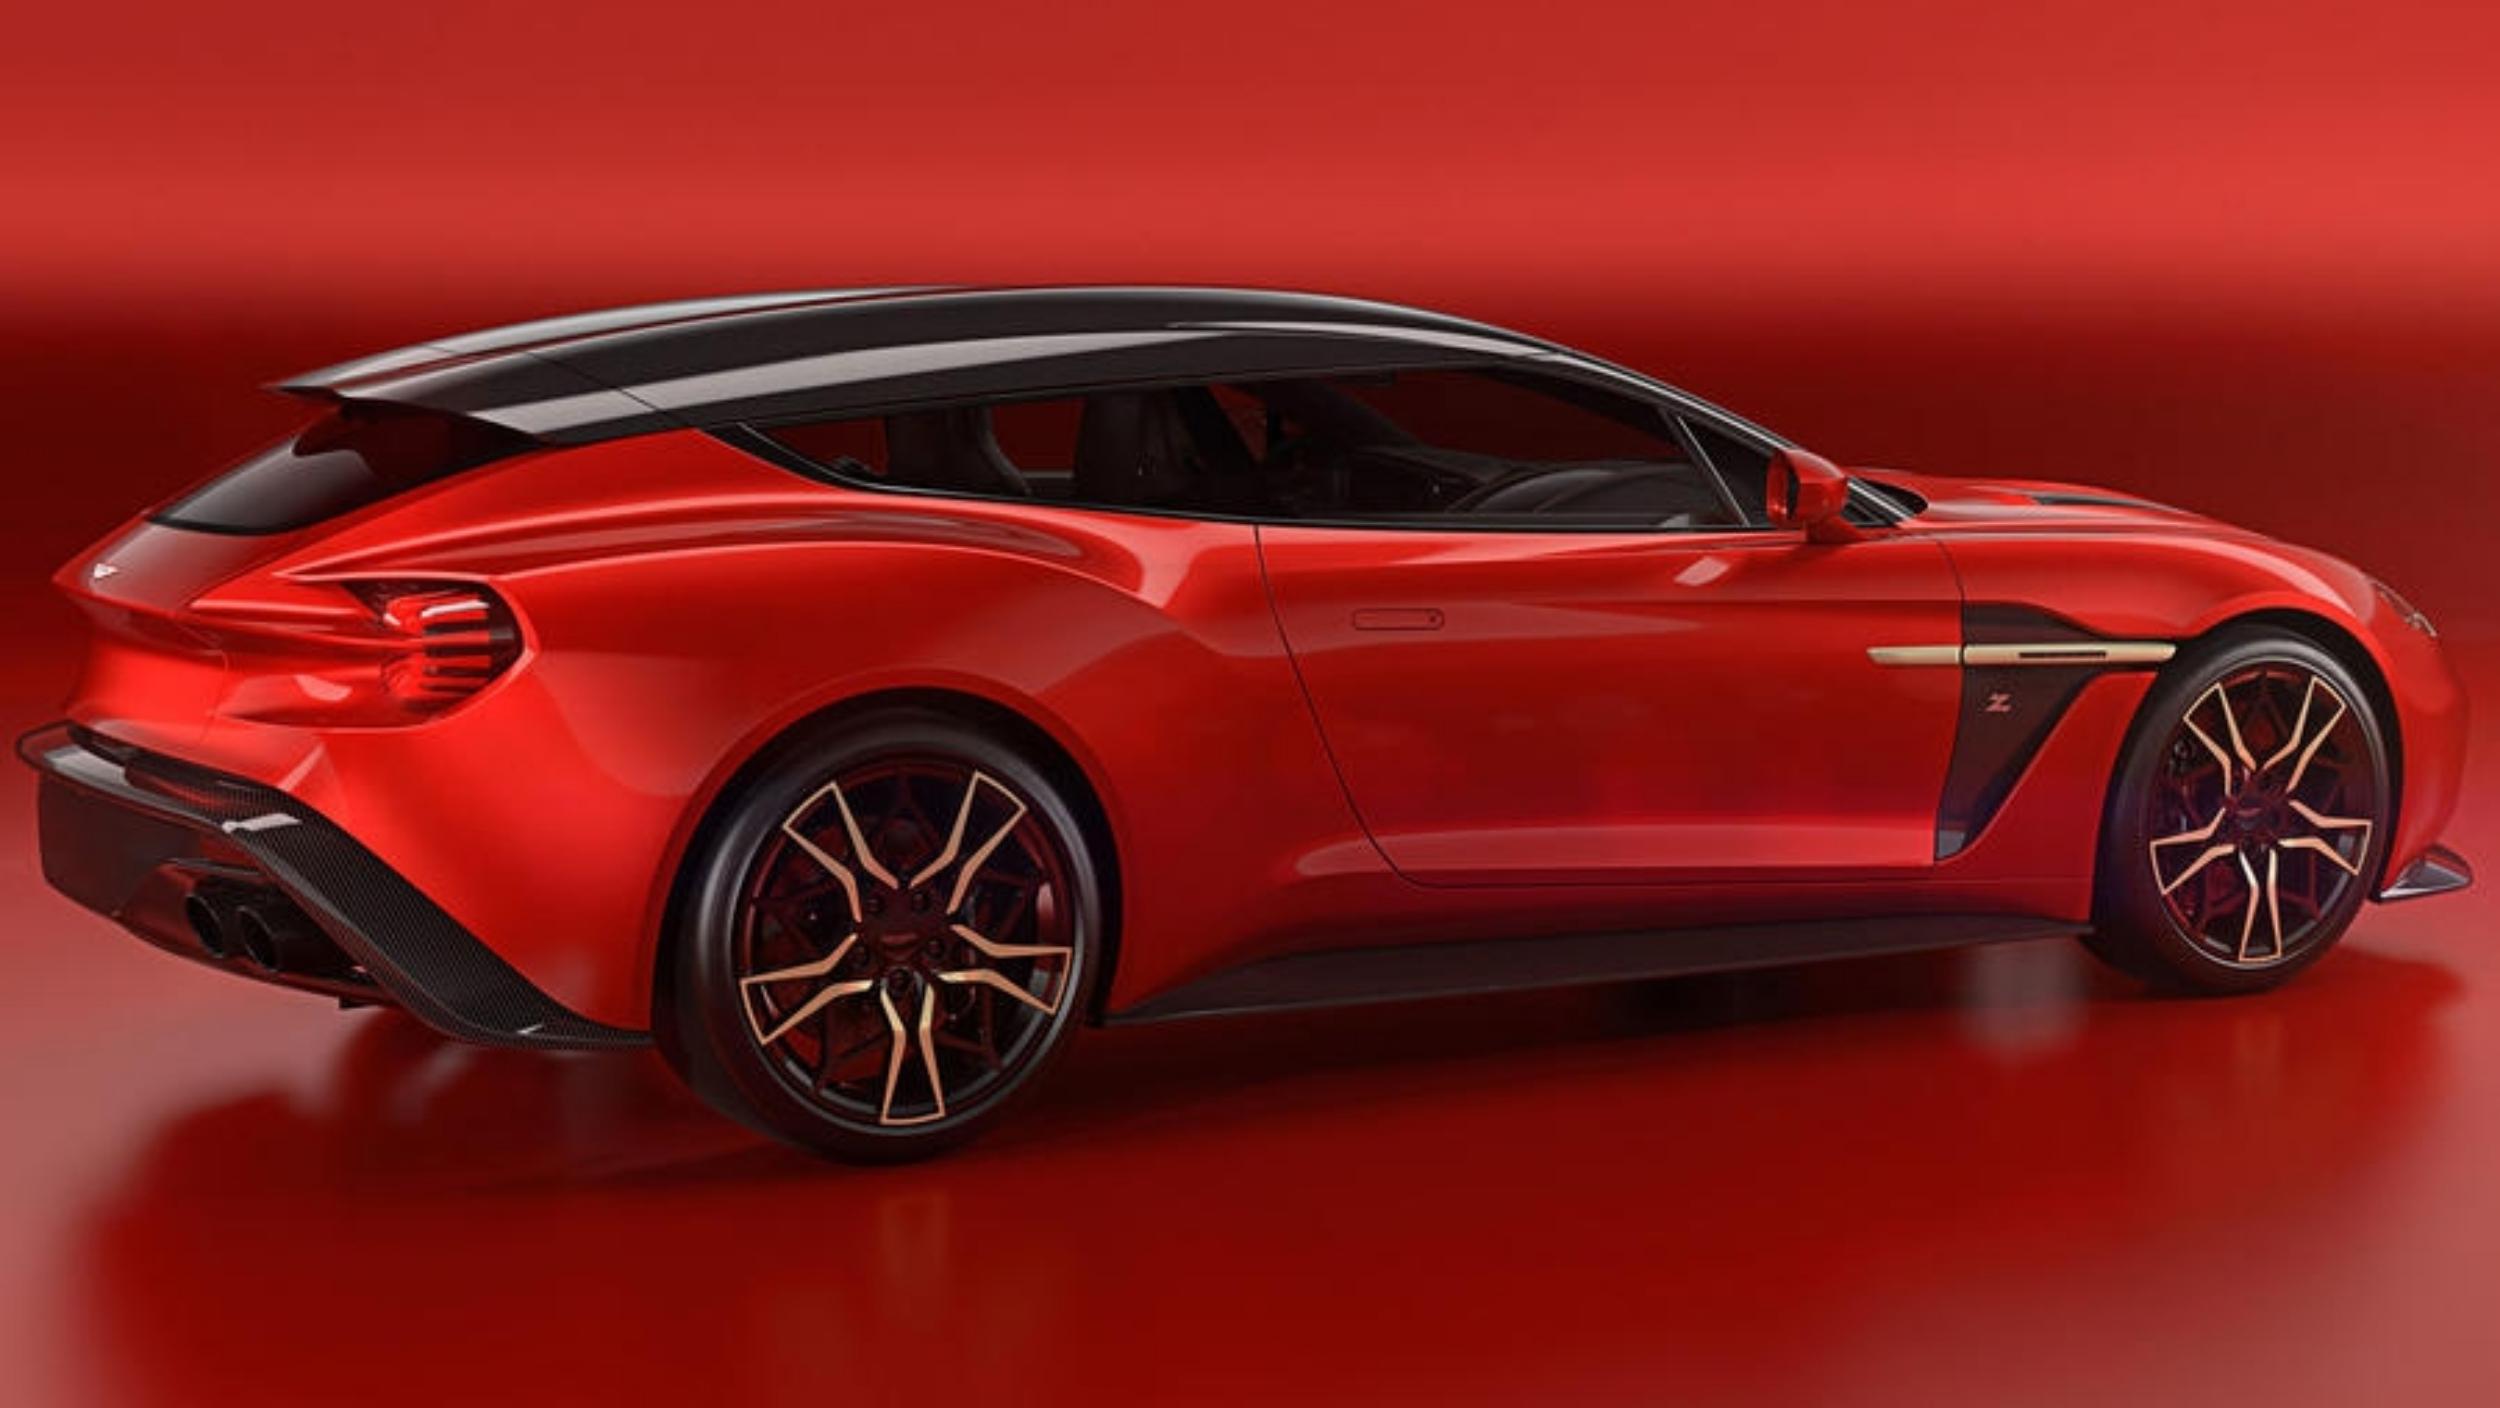 News Aston Martin Reveals Vanquish Zagato Shooting Brake